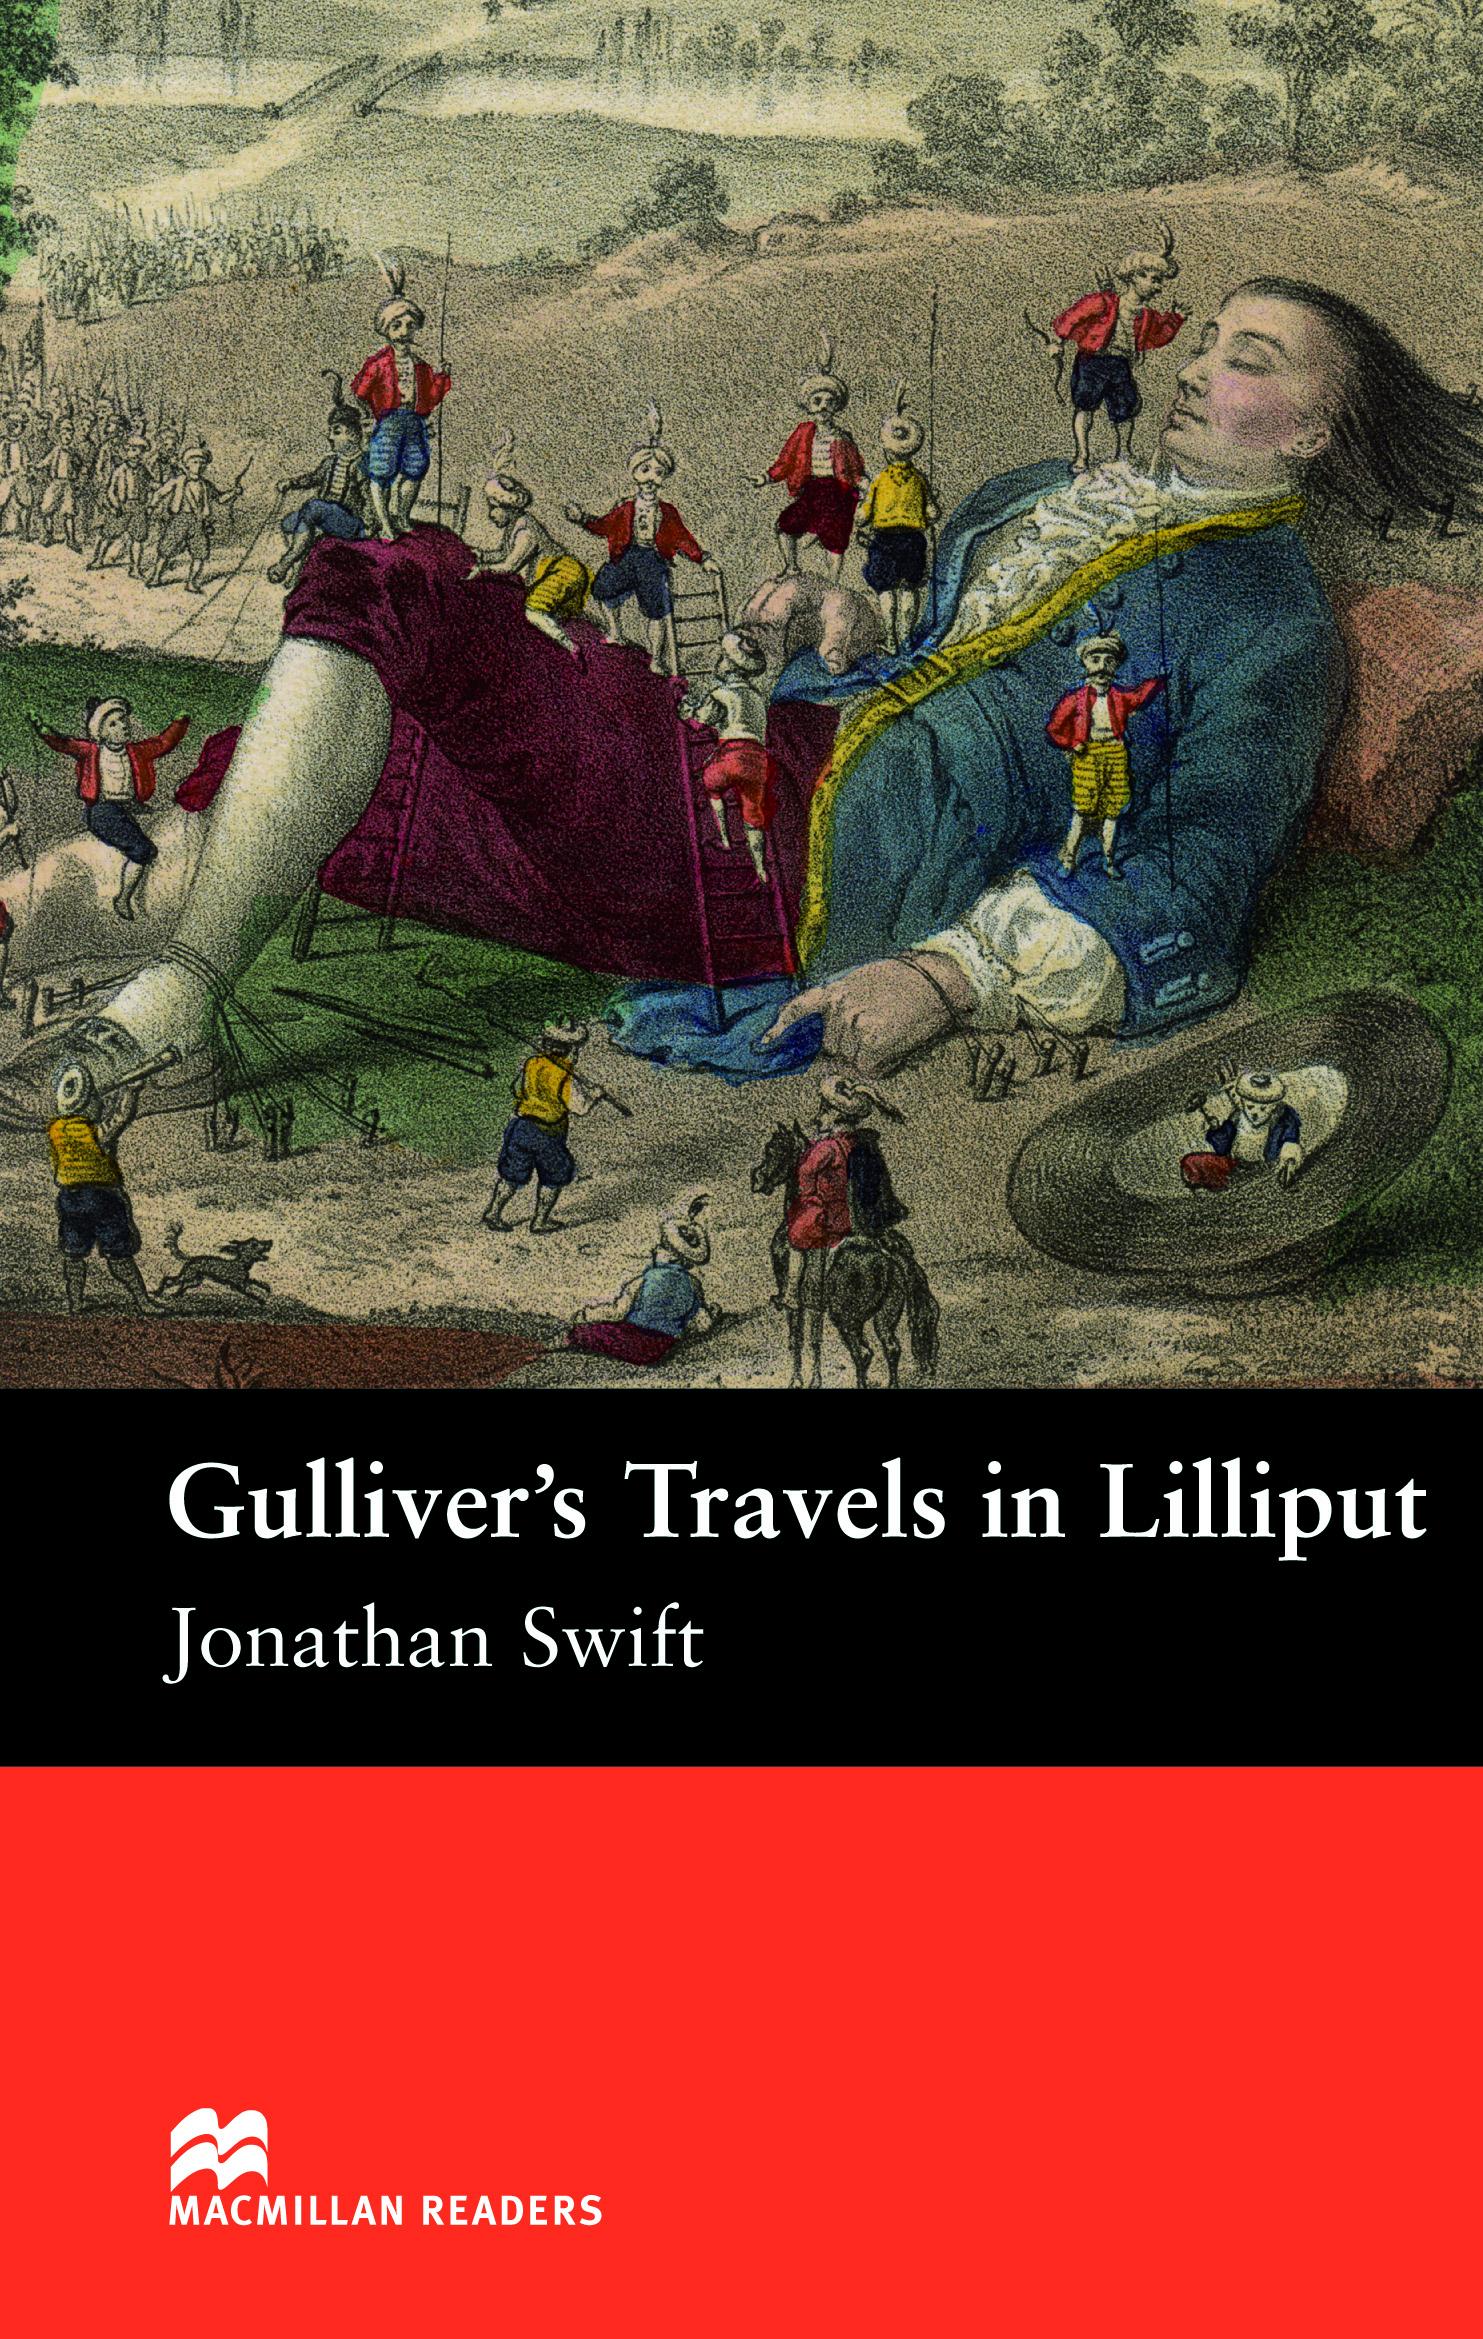 Macmillan Readers: Gulliver